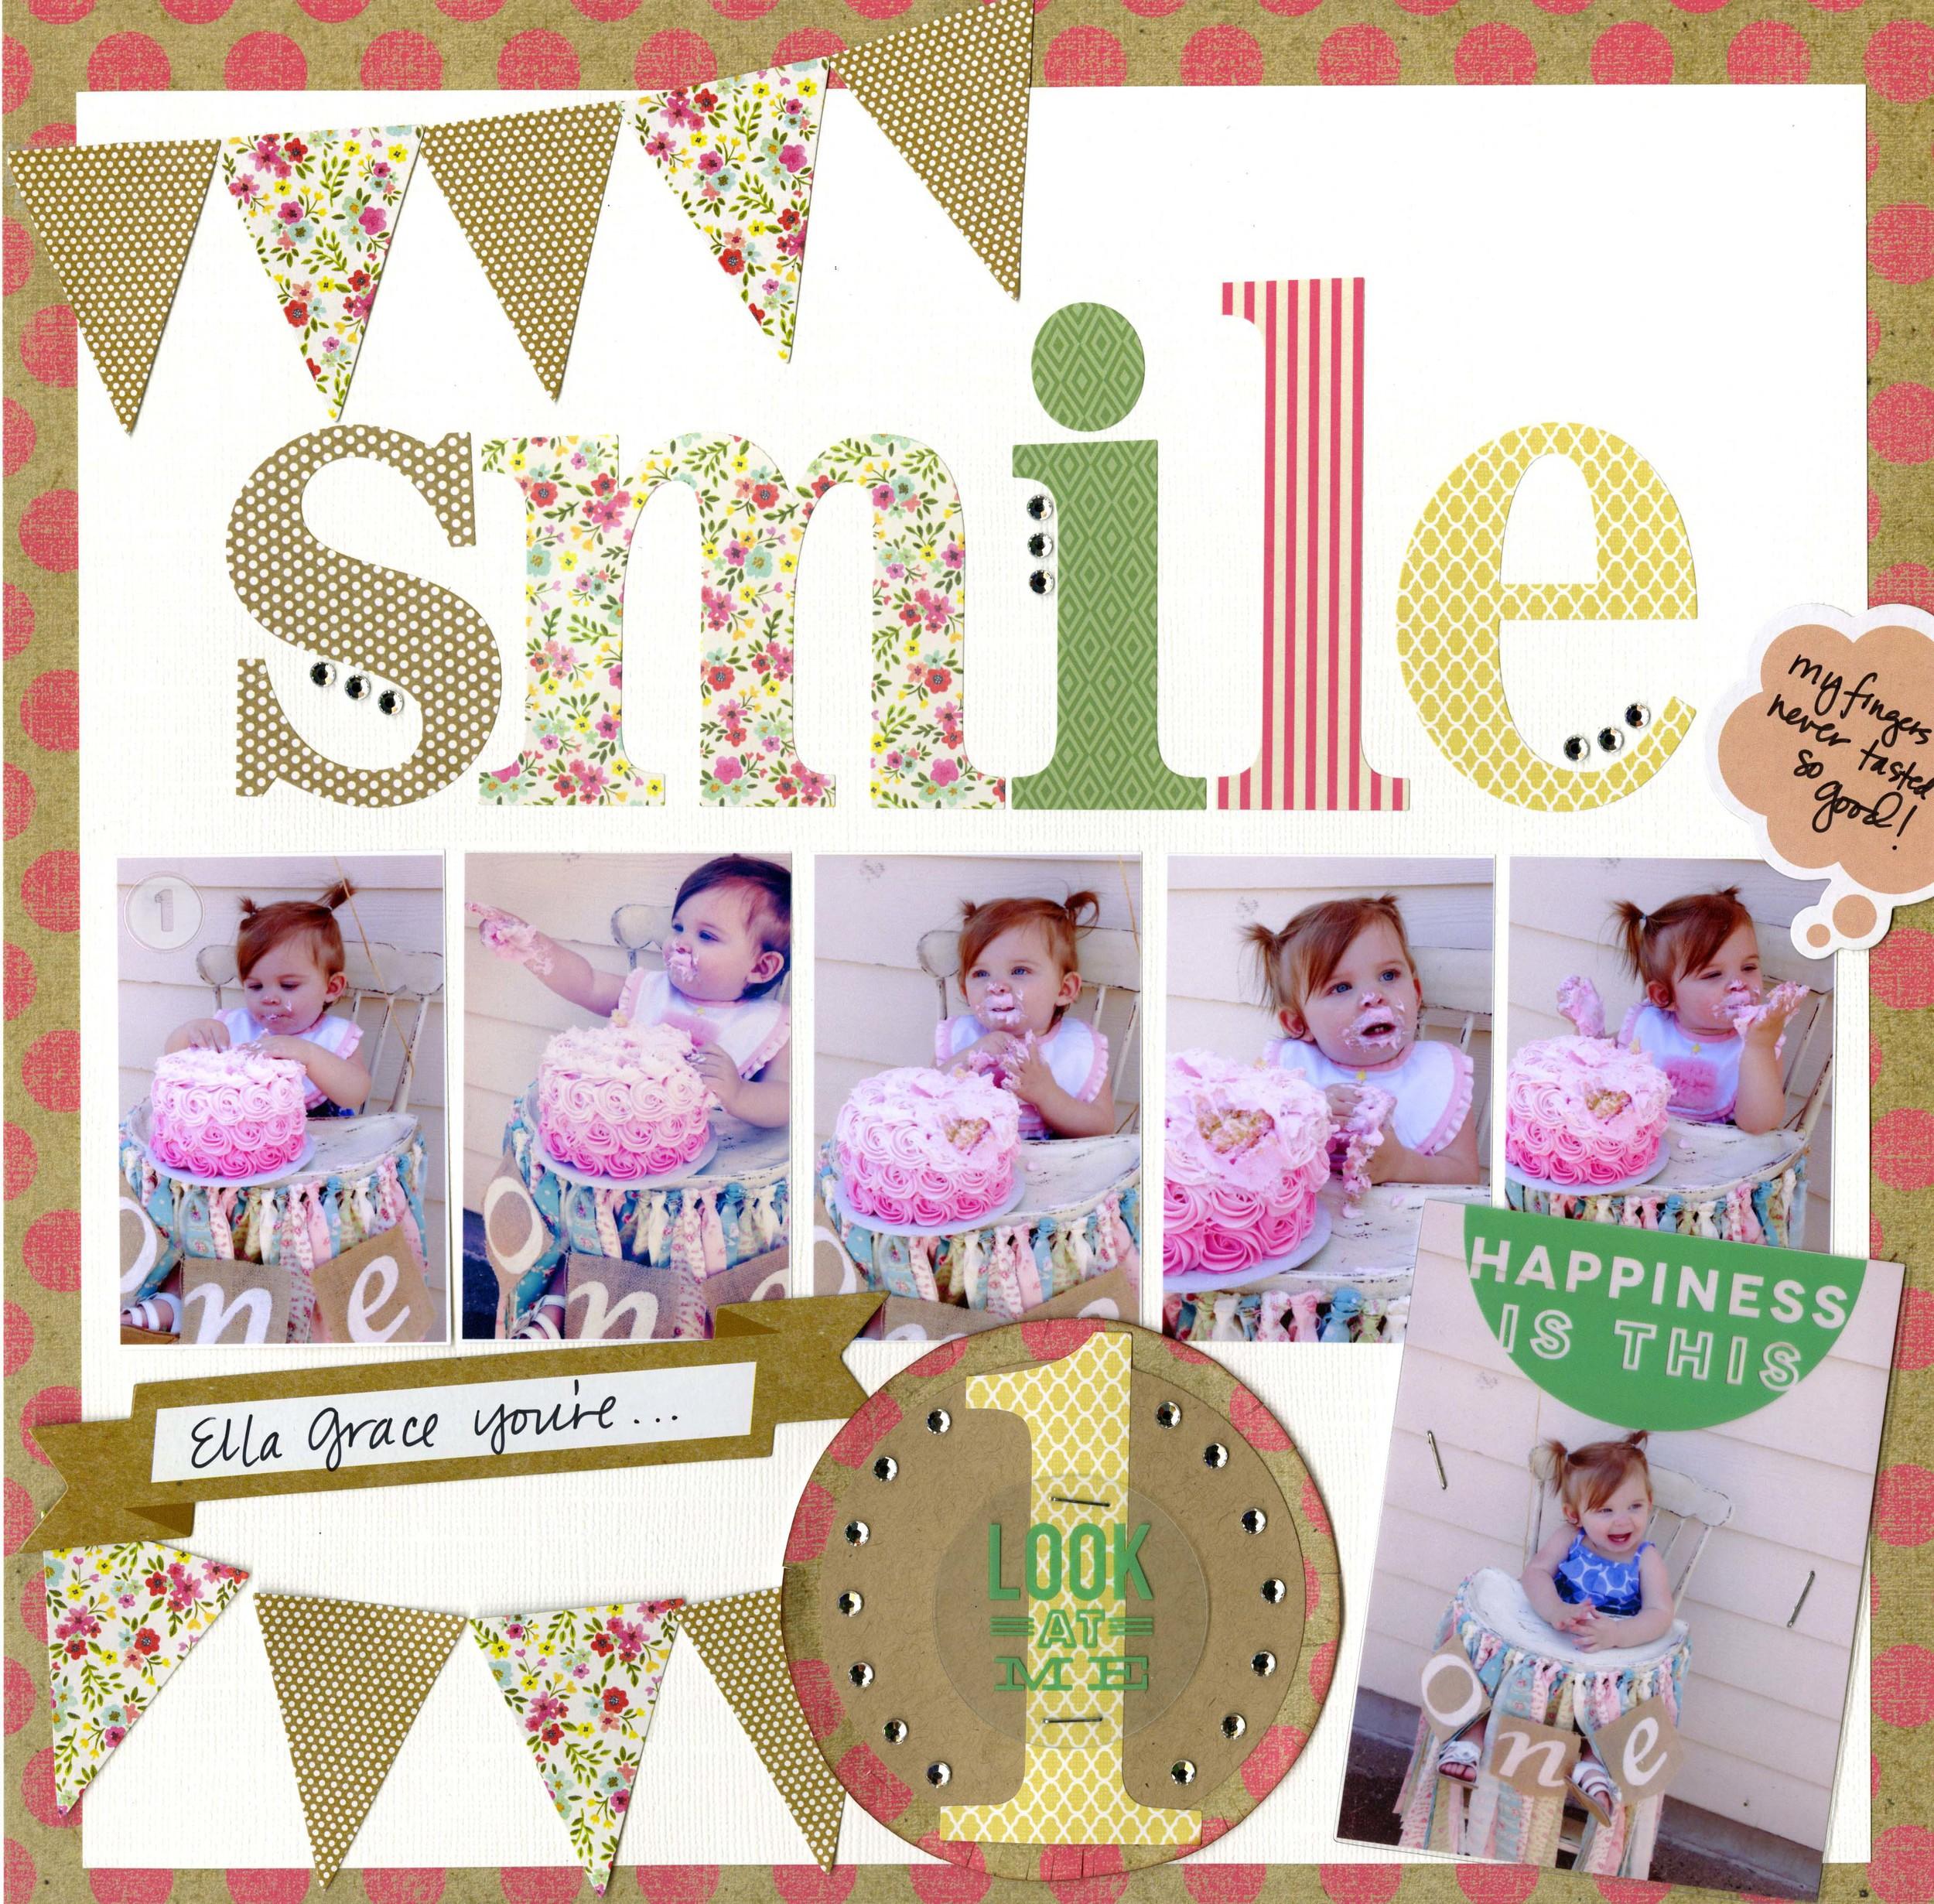 mambi SNEAK PEEK.  New banners, overlays and caption bubbles.  Scrapbooking fun!